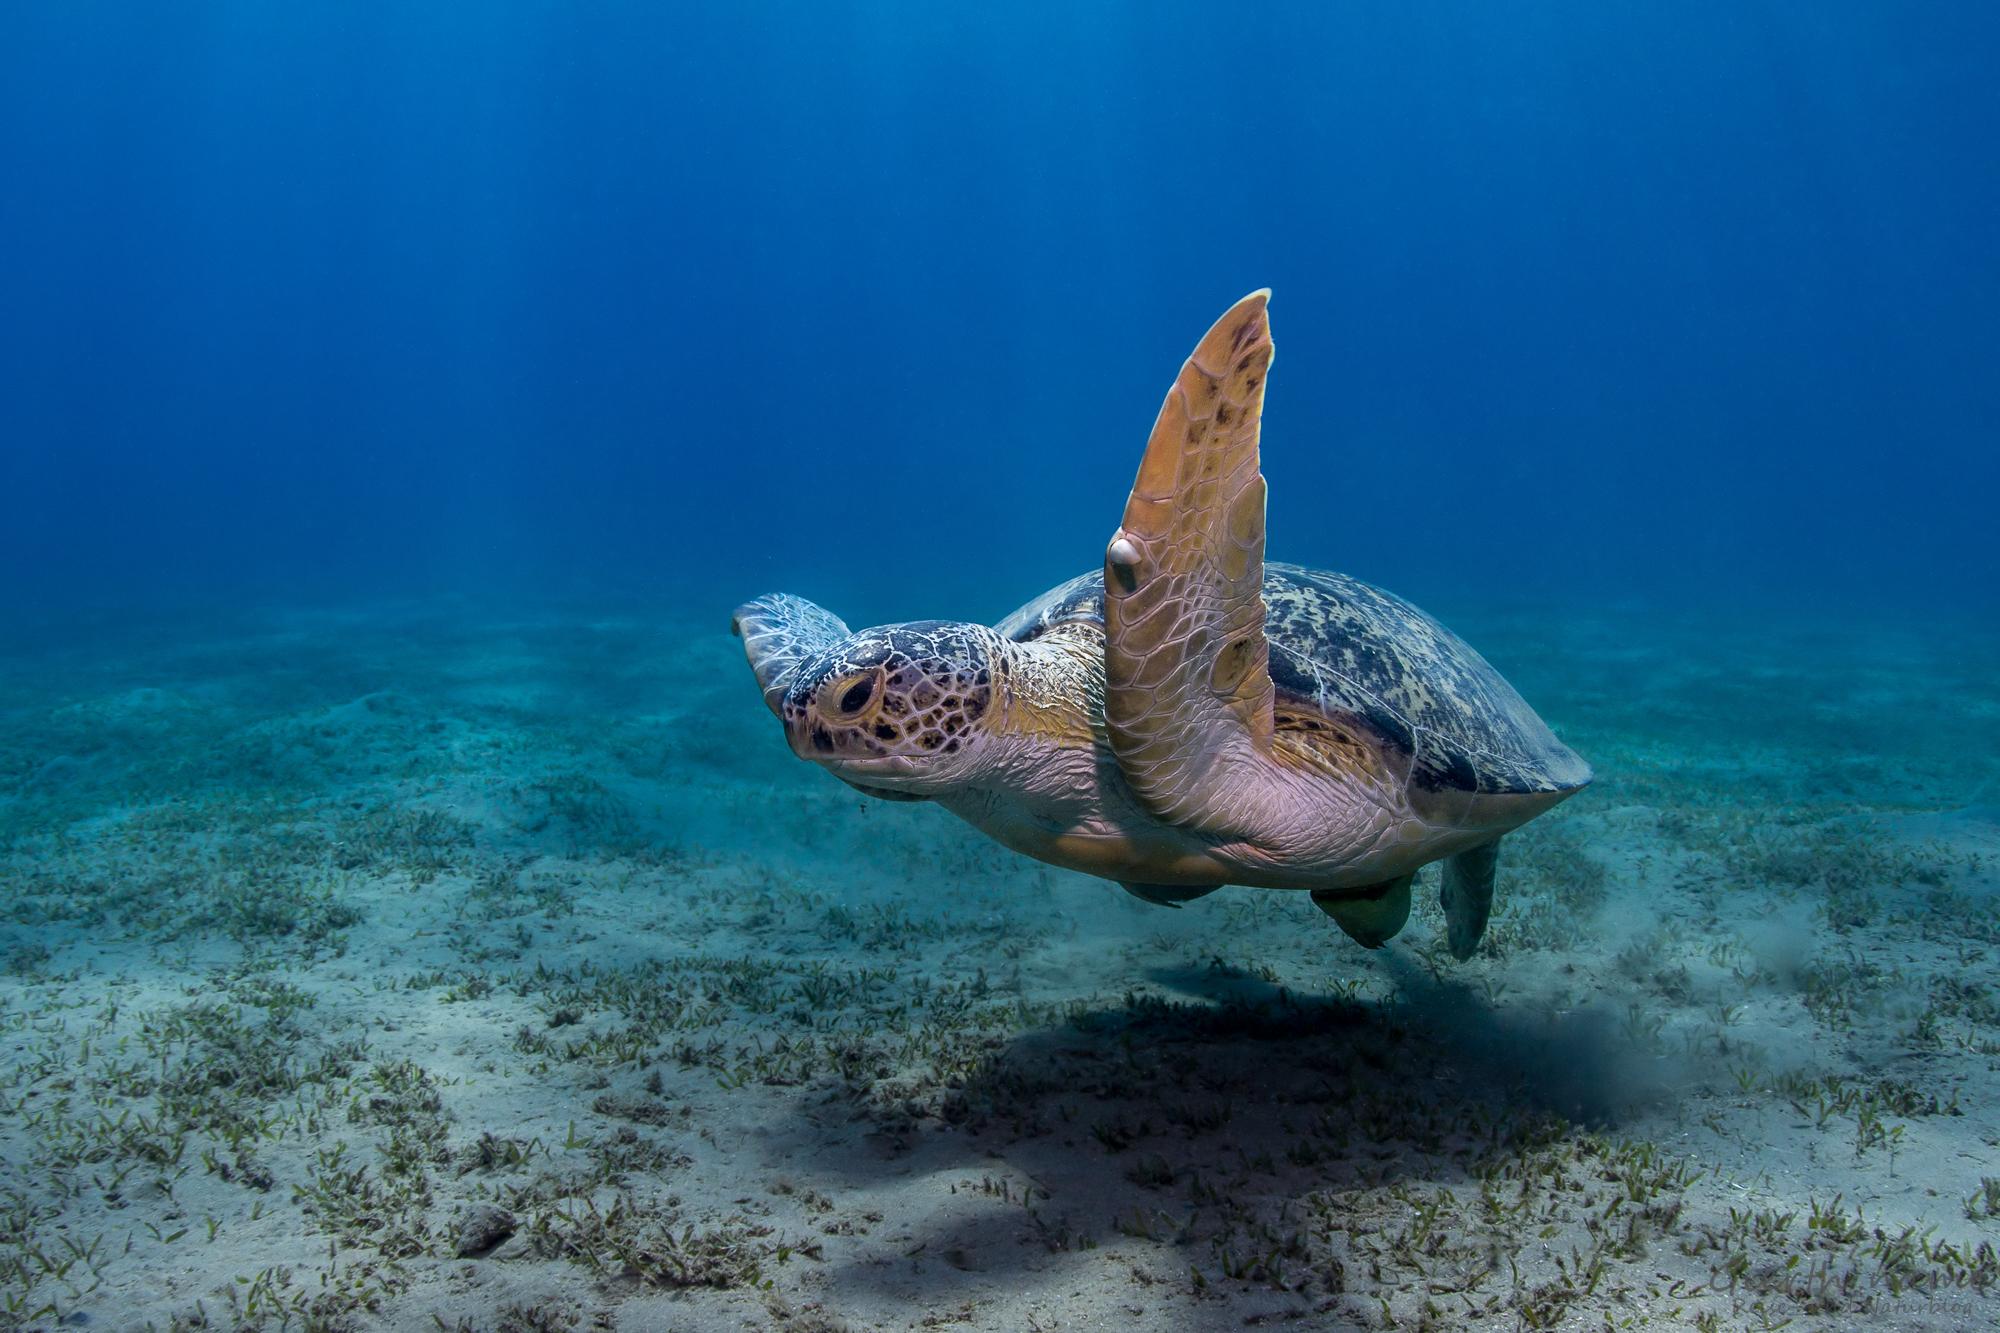 Grüne Schildkröte Abu Dabab